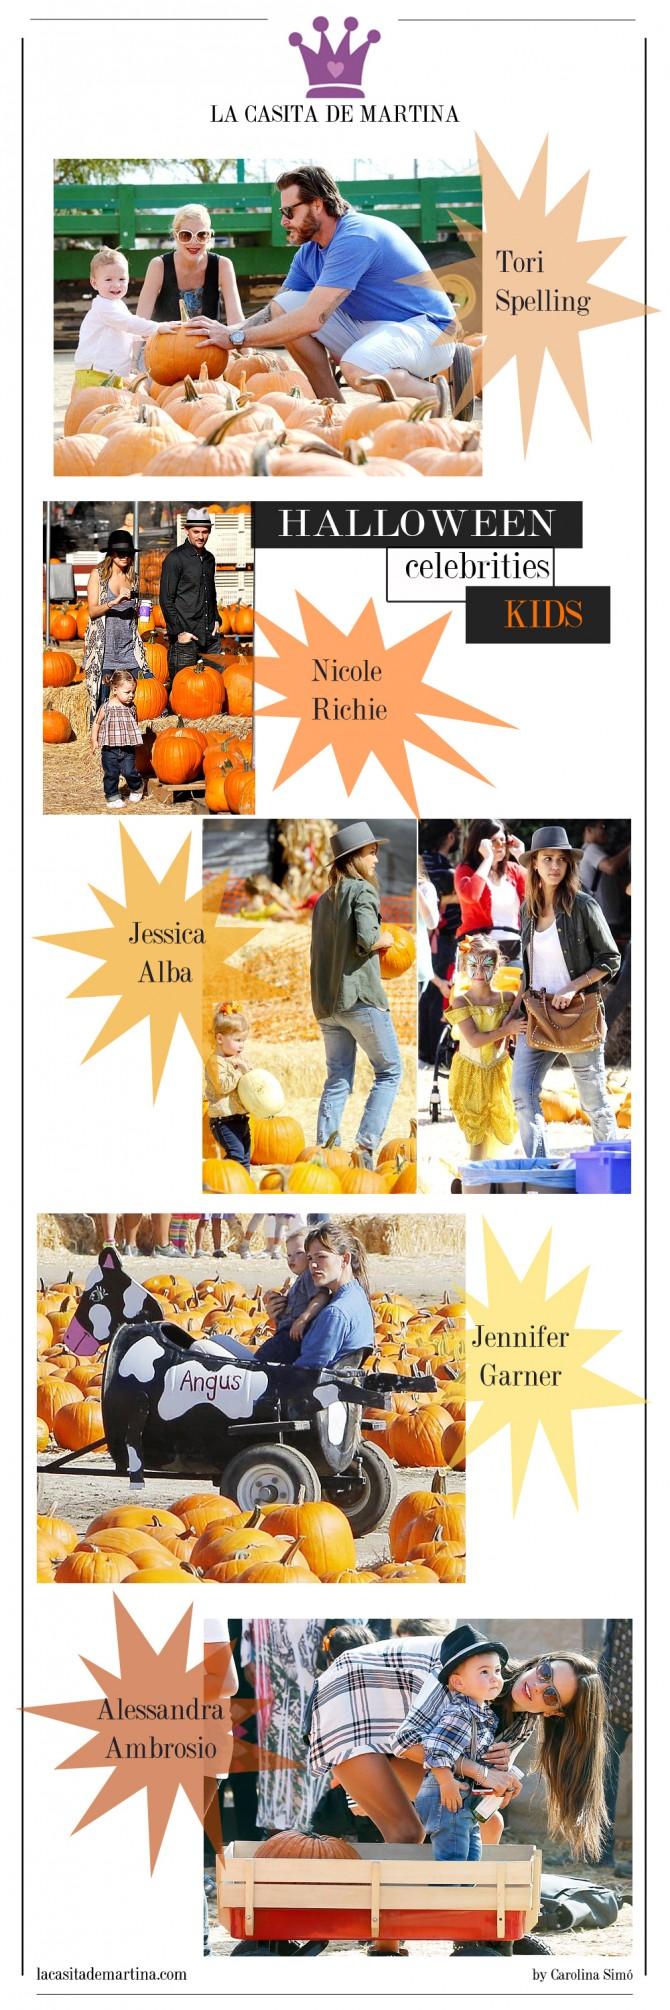 Halloween, Blog Moda Infantil, La casita de Martina, Carolina Simo